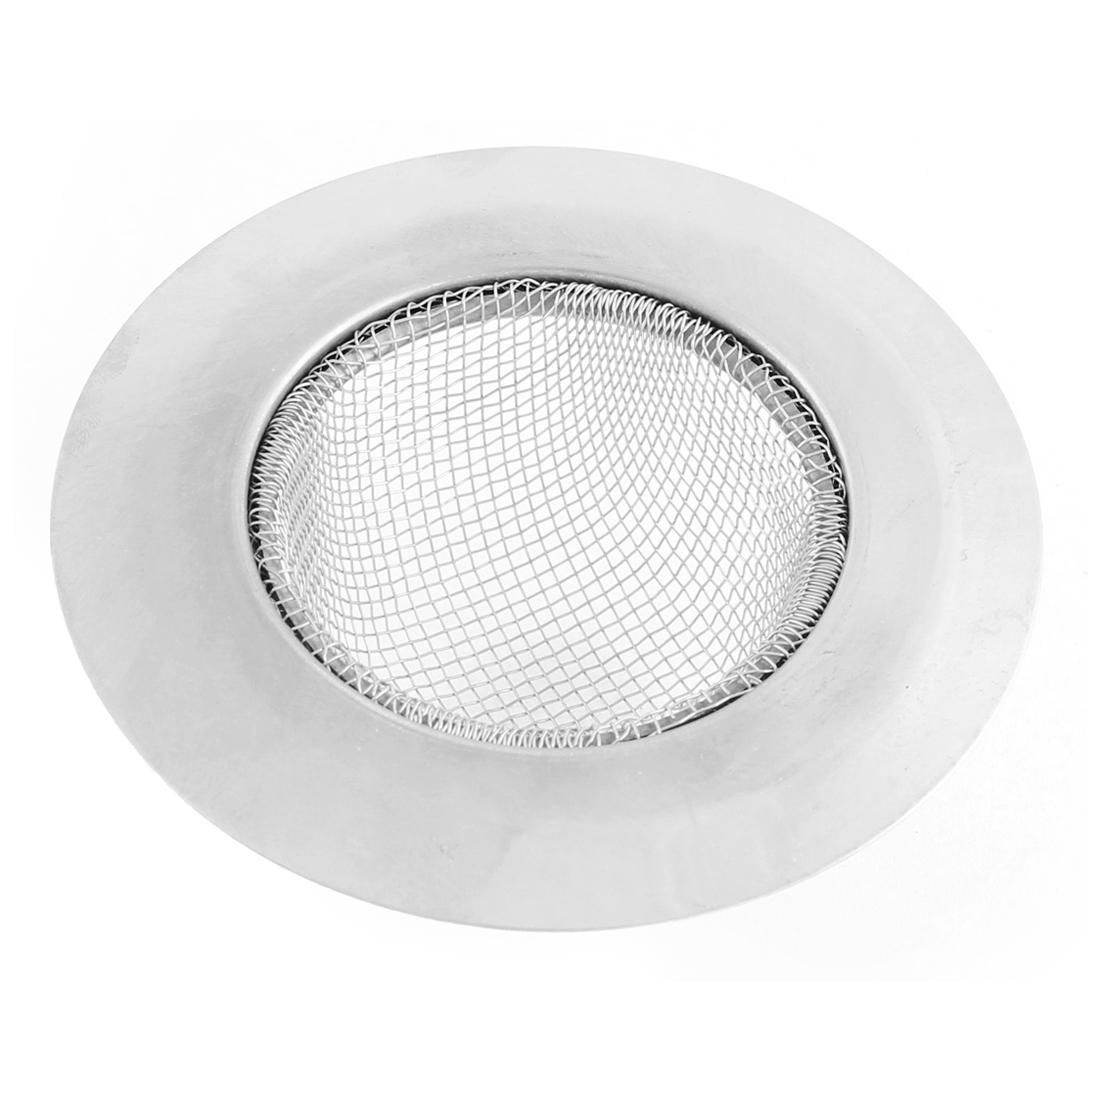 Kitchen Bathroom Metal Basin Sink Floor Mesh Drainer Strainer Filter Hair Stopper 9cm Dia